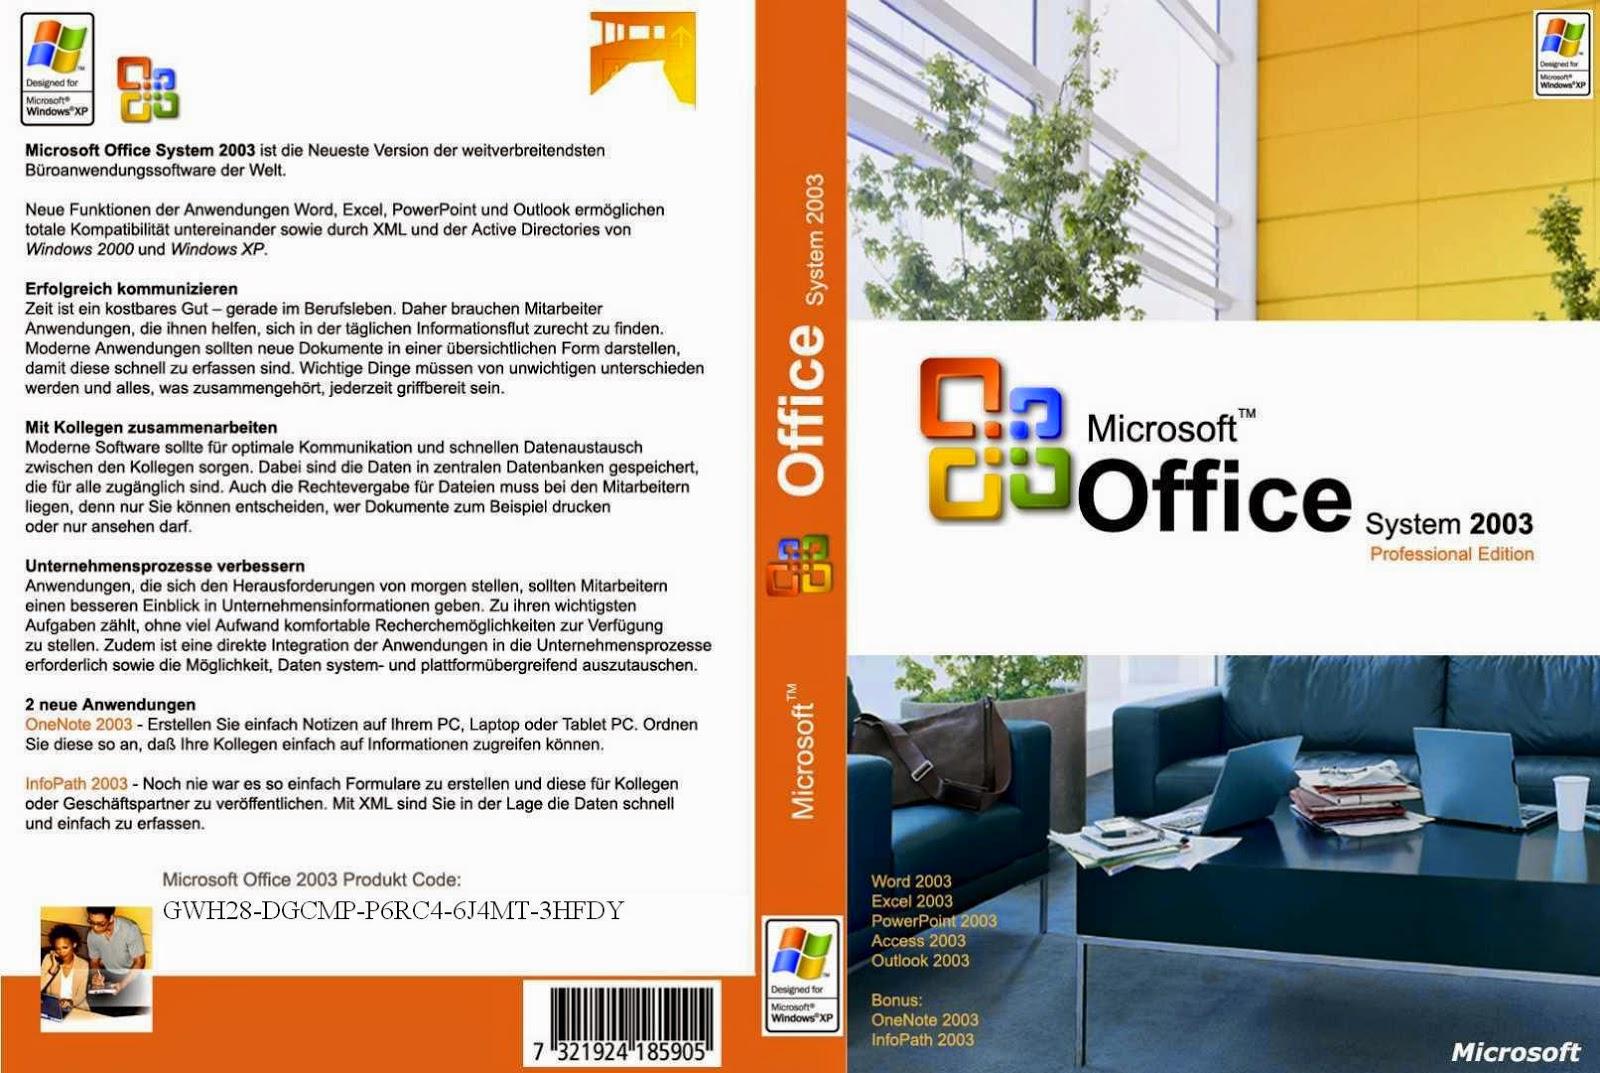 microsoft office professional edition 2003 iso